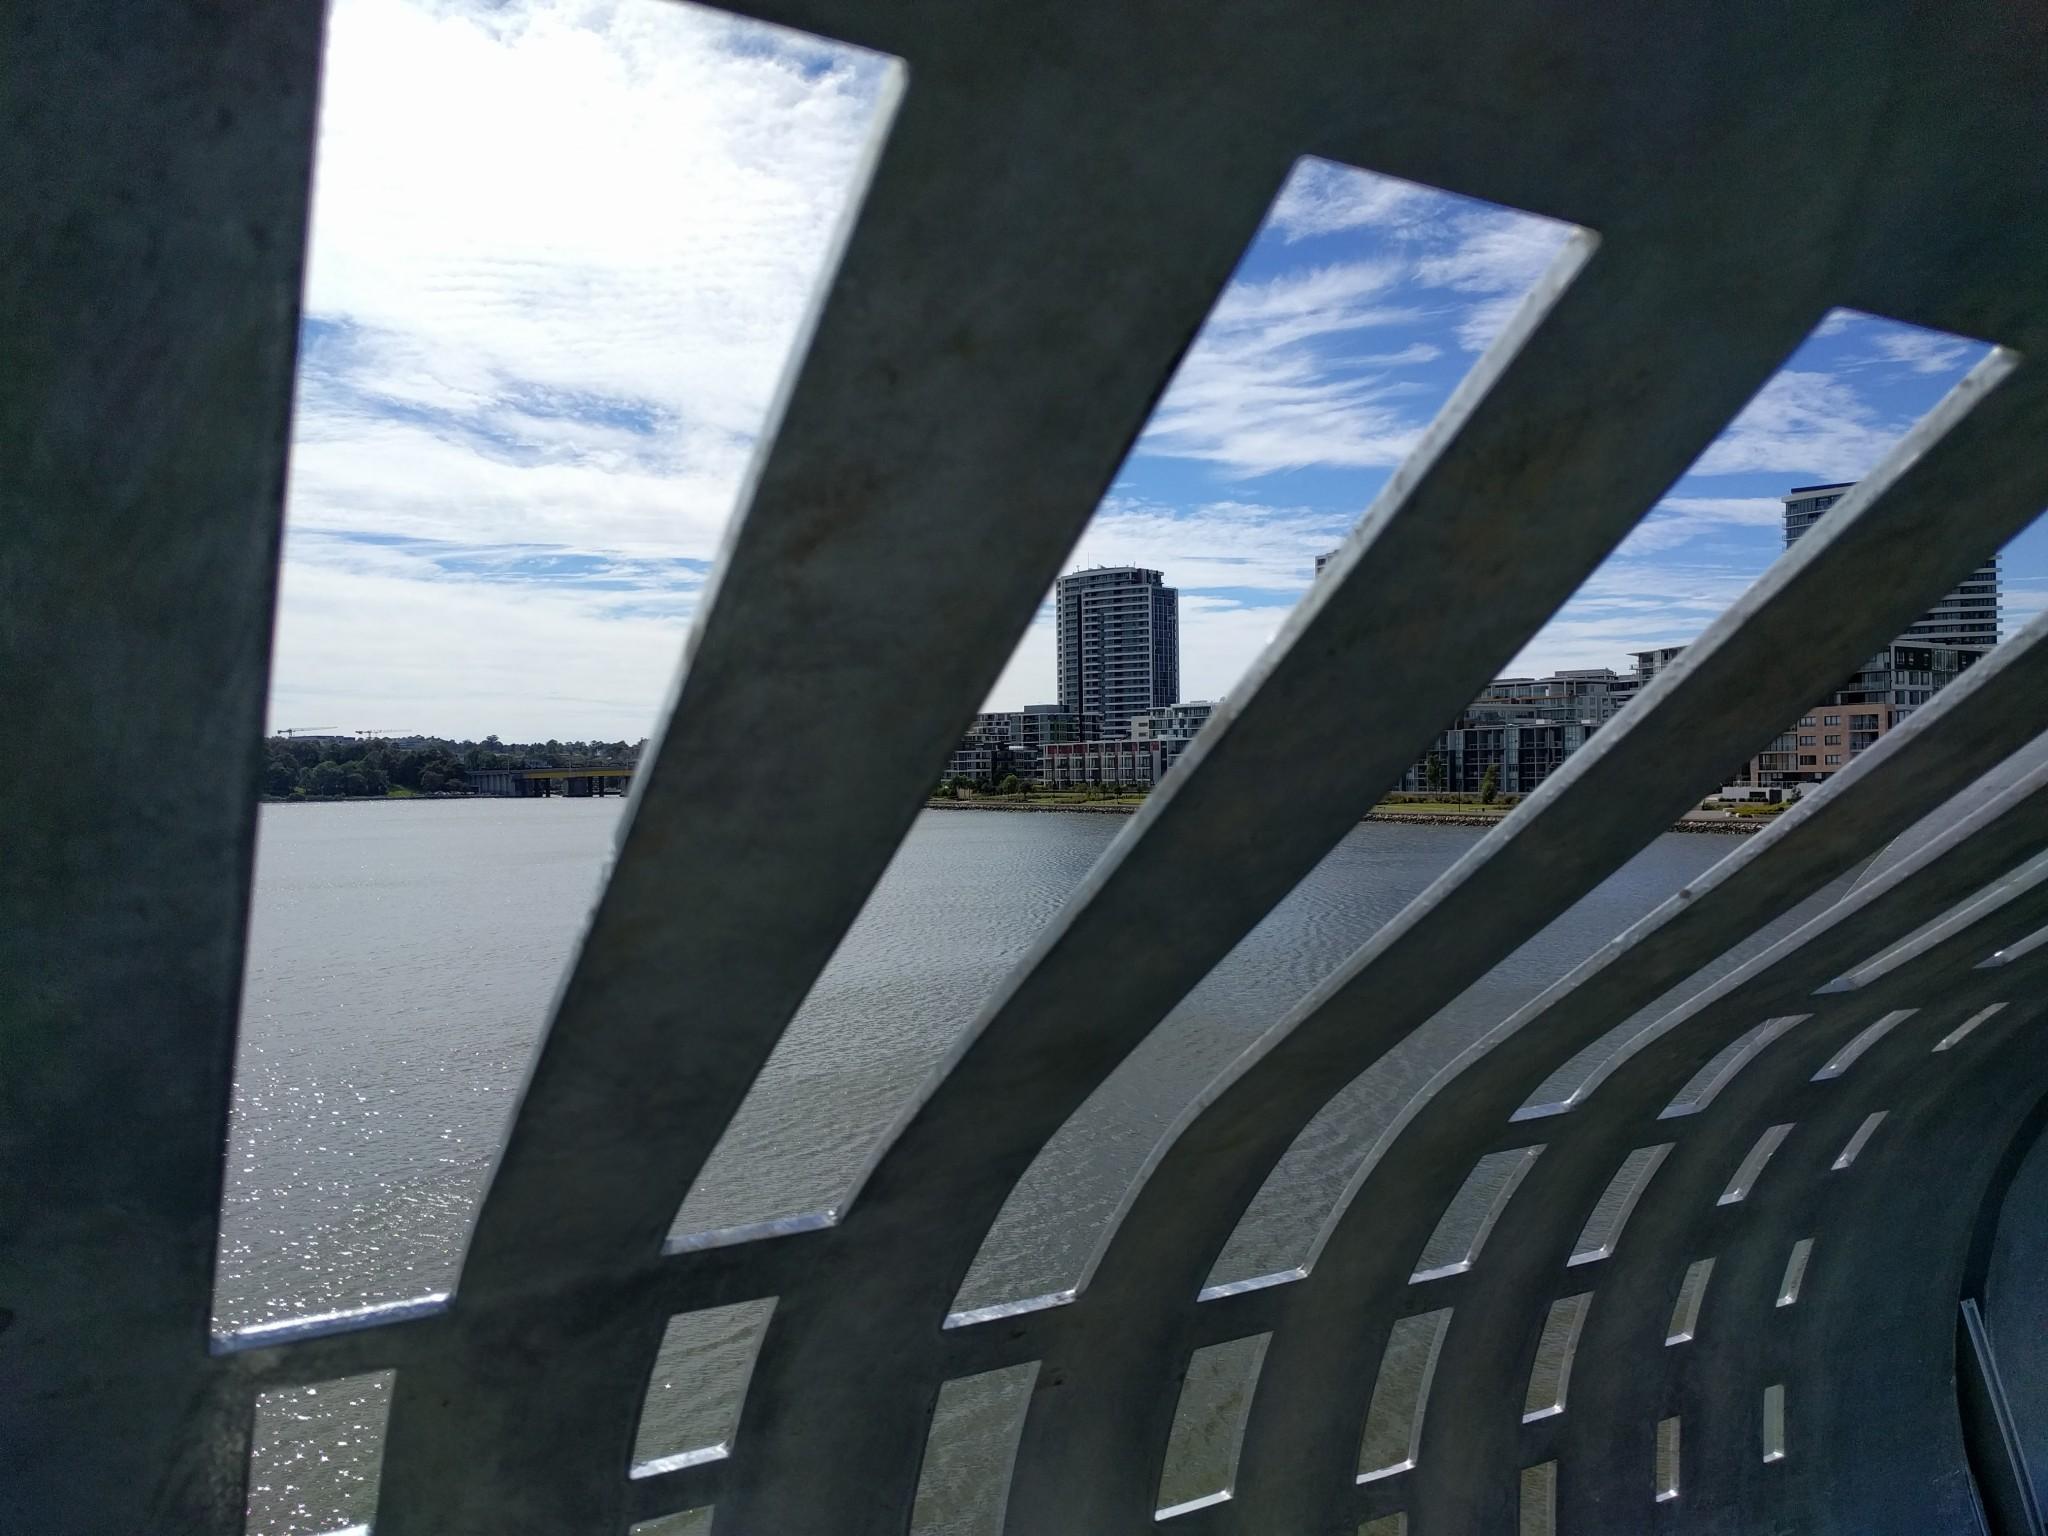 Bennelong Bridge